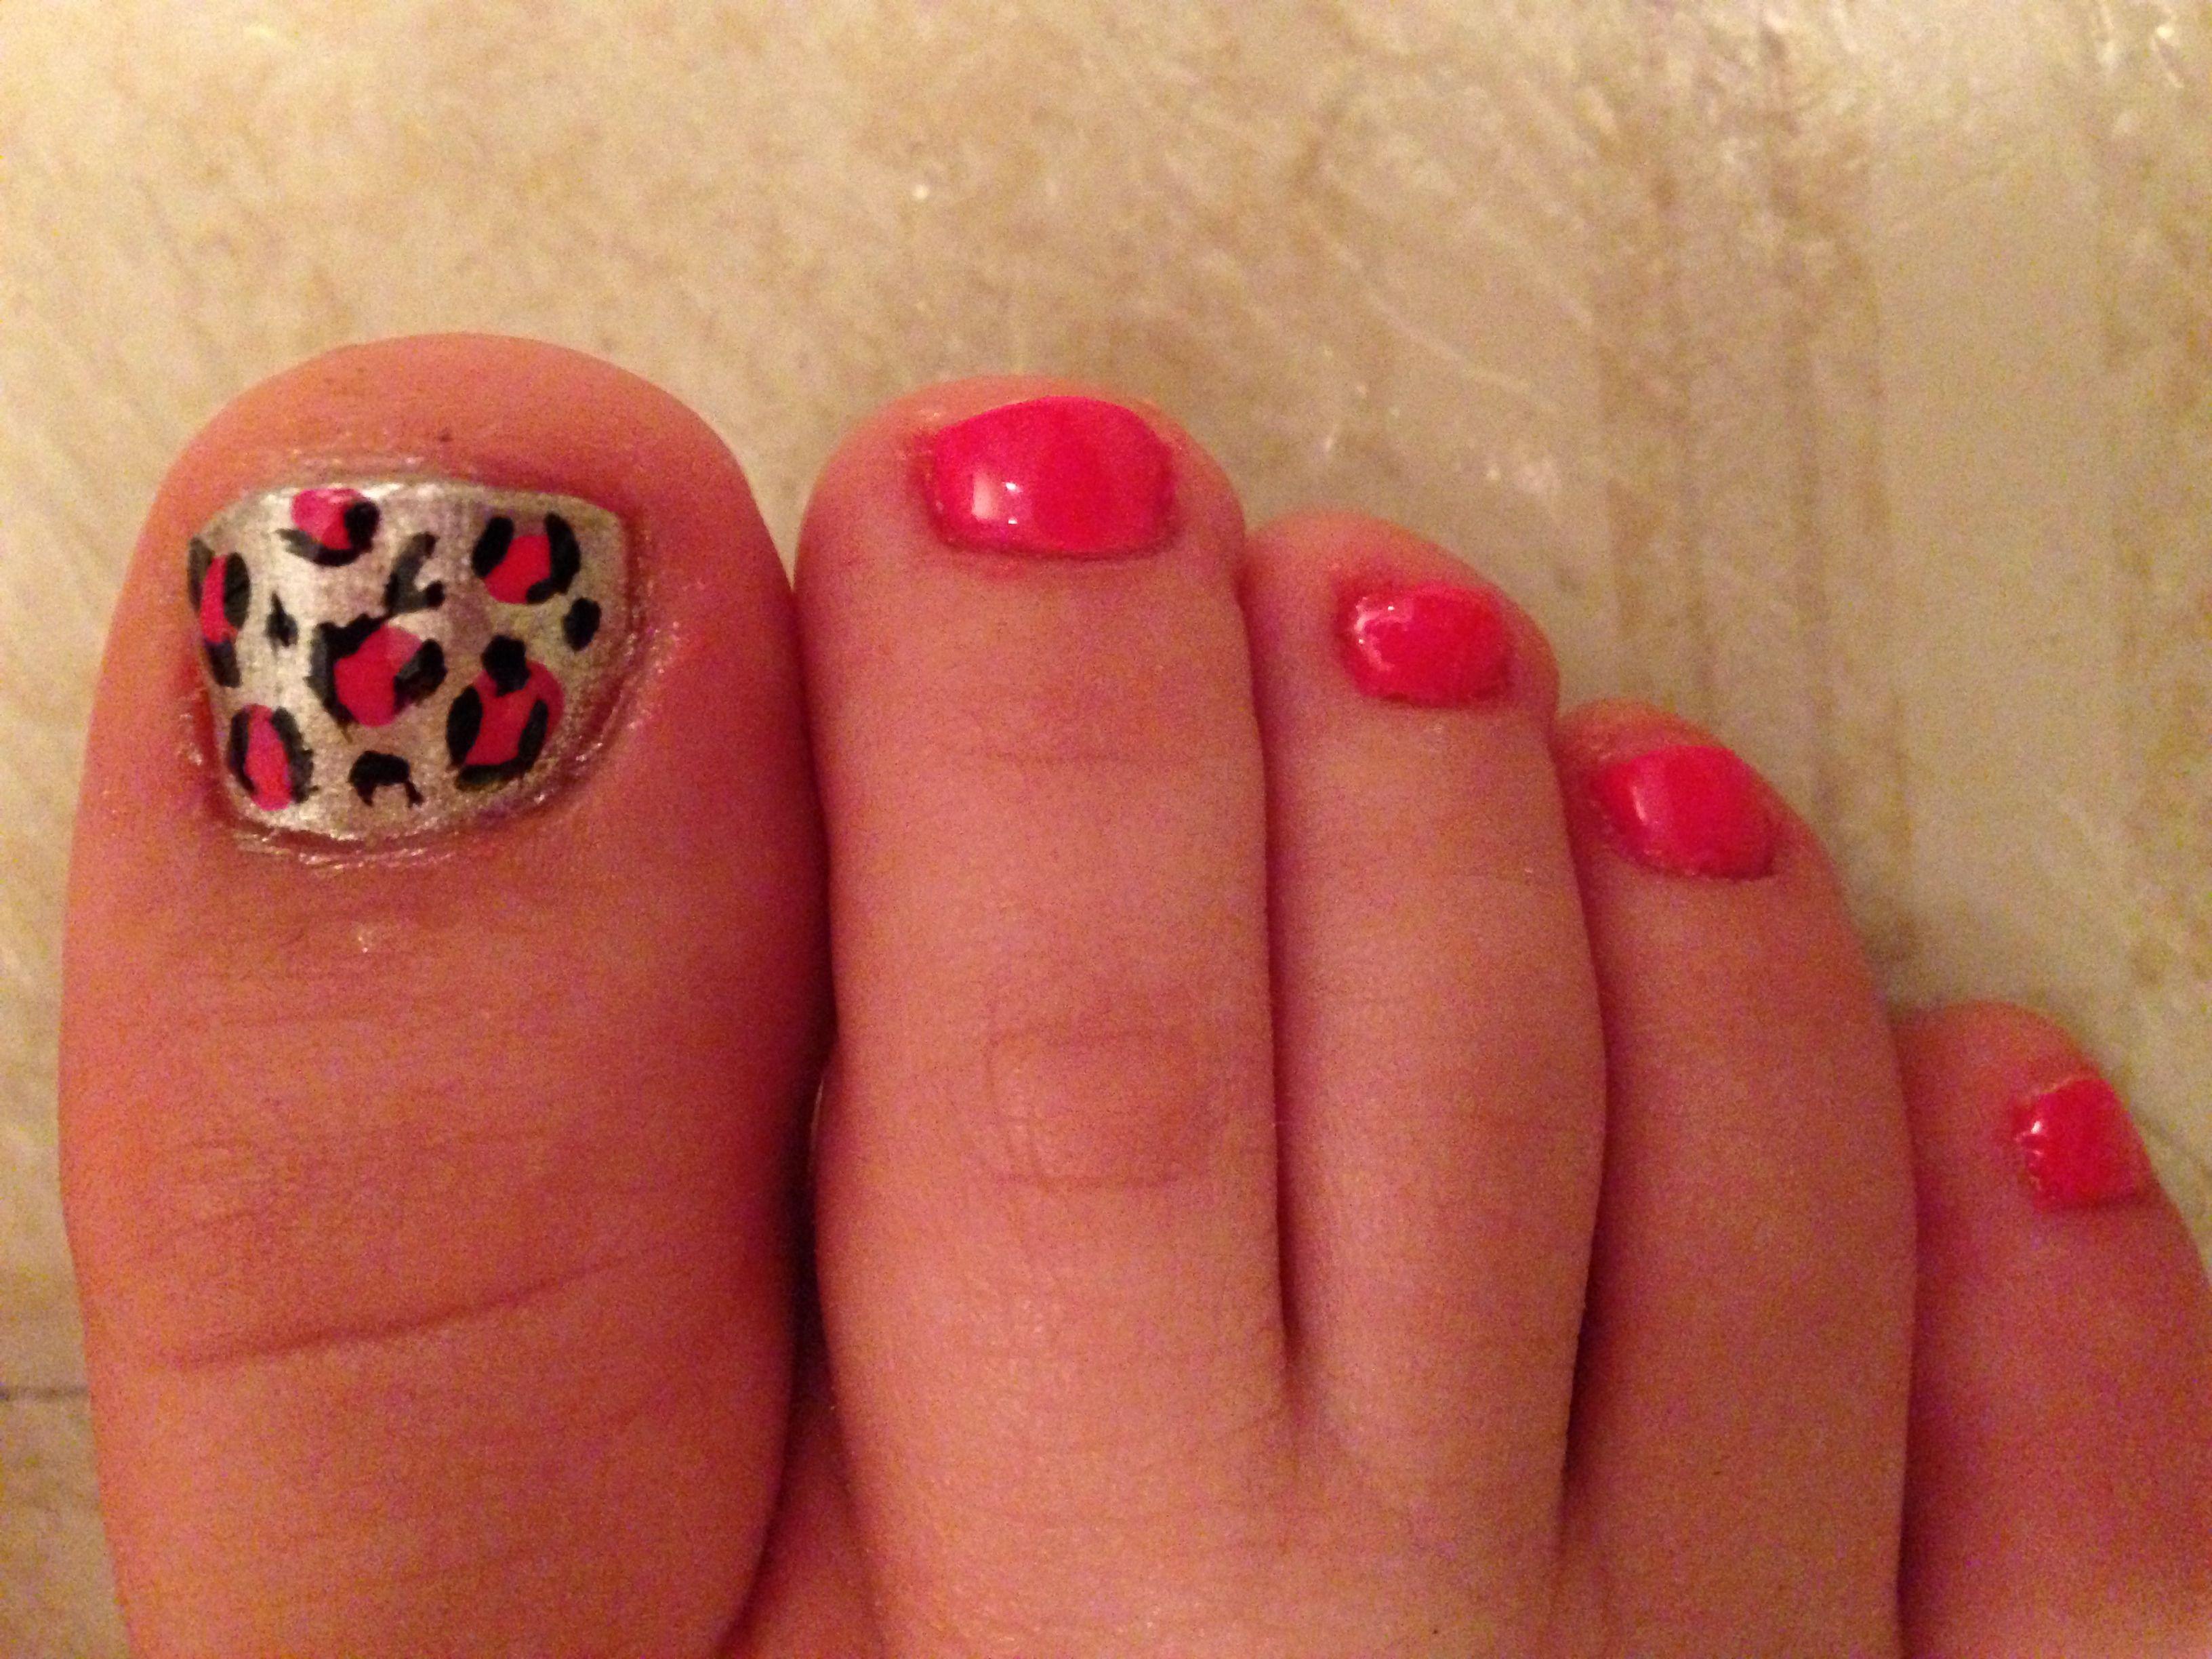 Toe nail art; silver/pink leopard print | awesome toenail ...